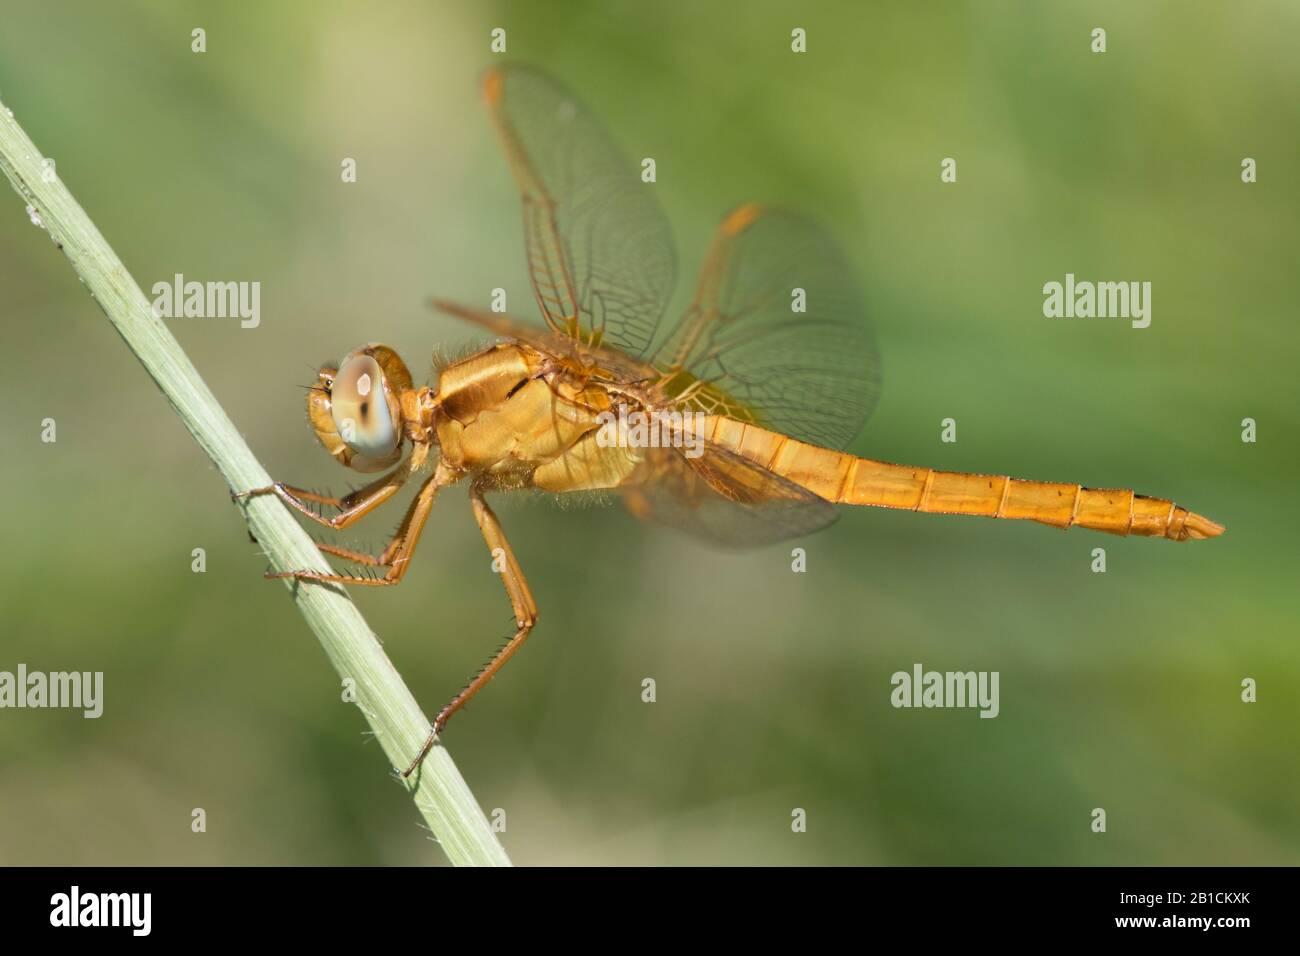 Broad Scarlet, Common Scarlet-darter, Scarlet Darter, Scarlet Dragonfly (Crocothemis erythraea, Croccothemis erythraea), Immature male, Spain, Huelva Stock Photo